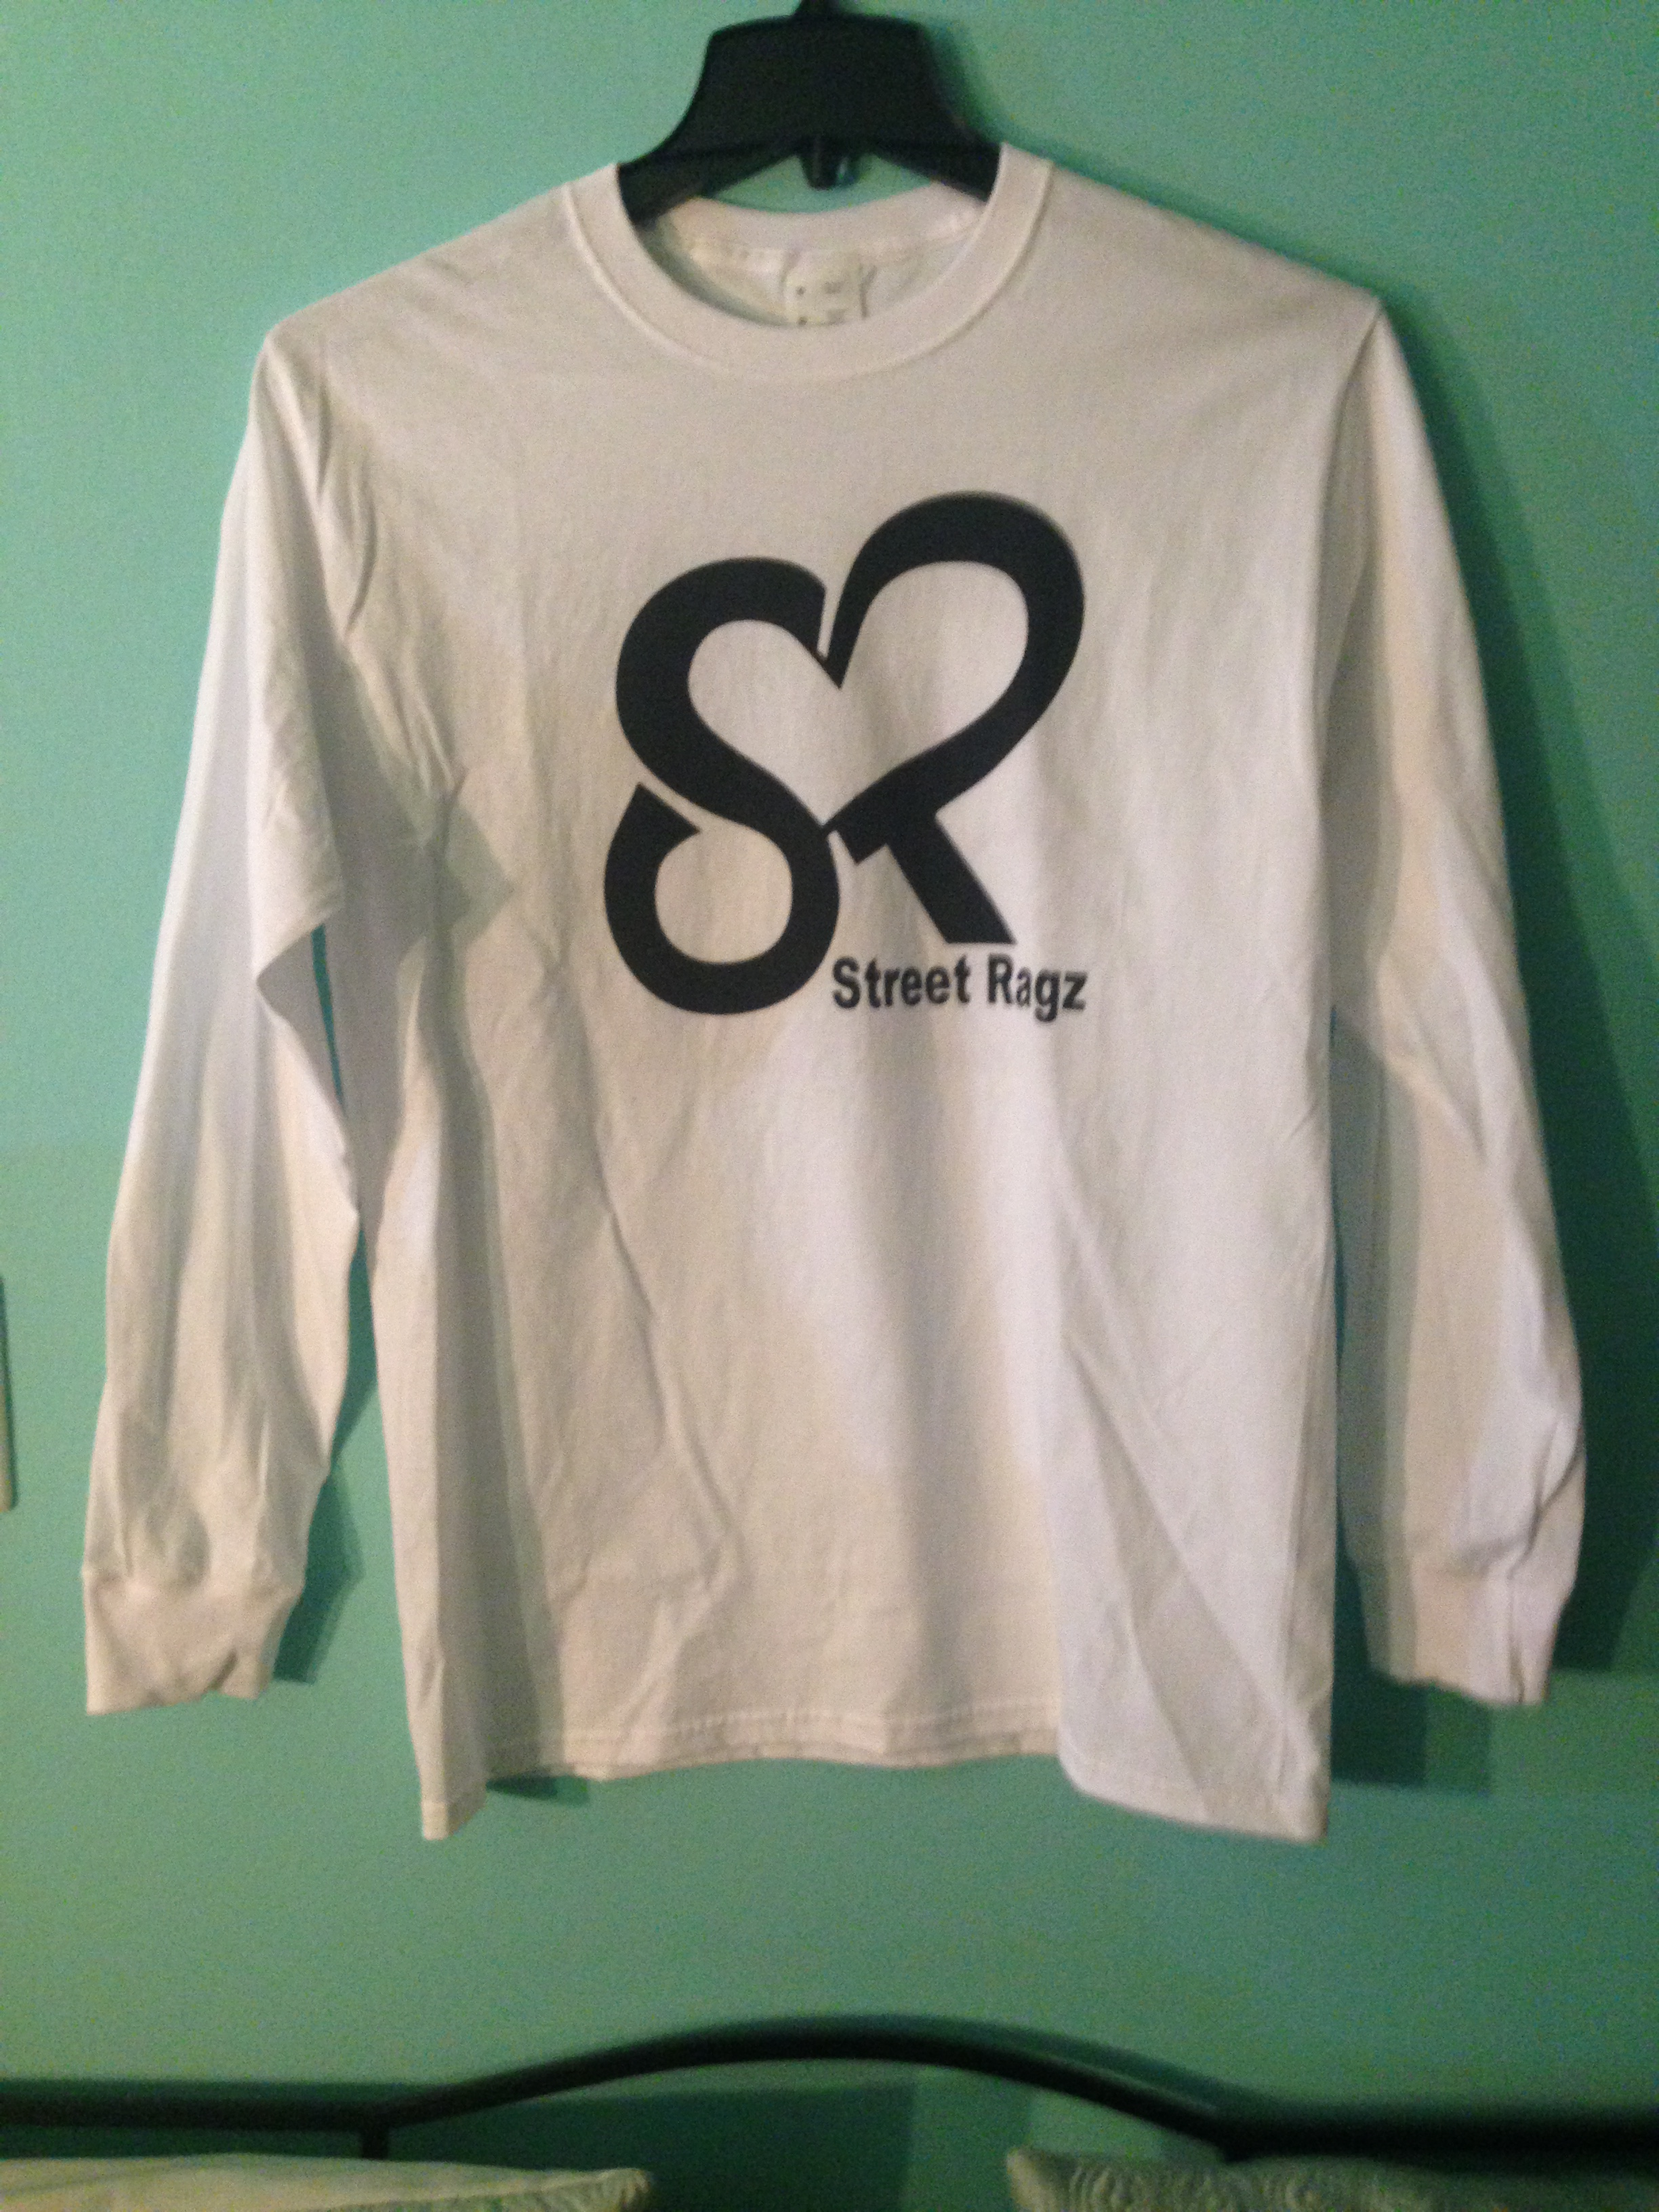 Street Ragz longsleeves T-shirt